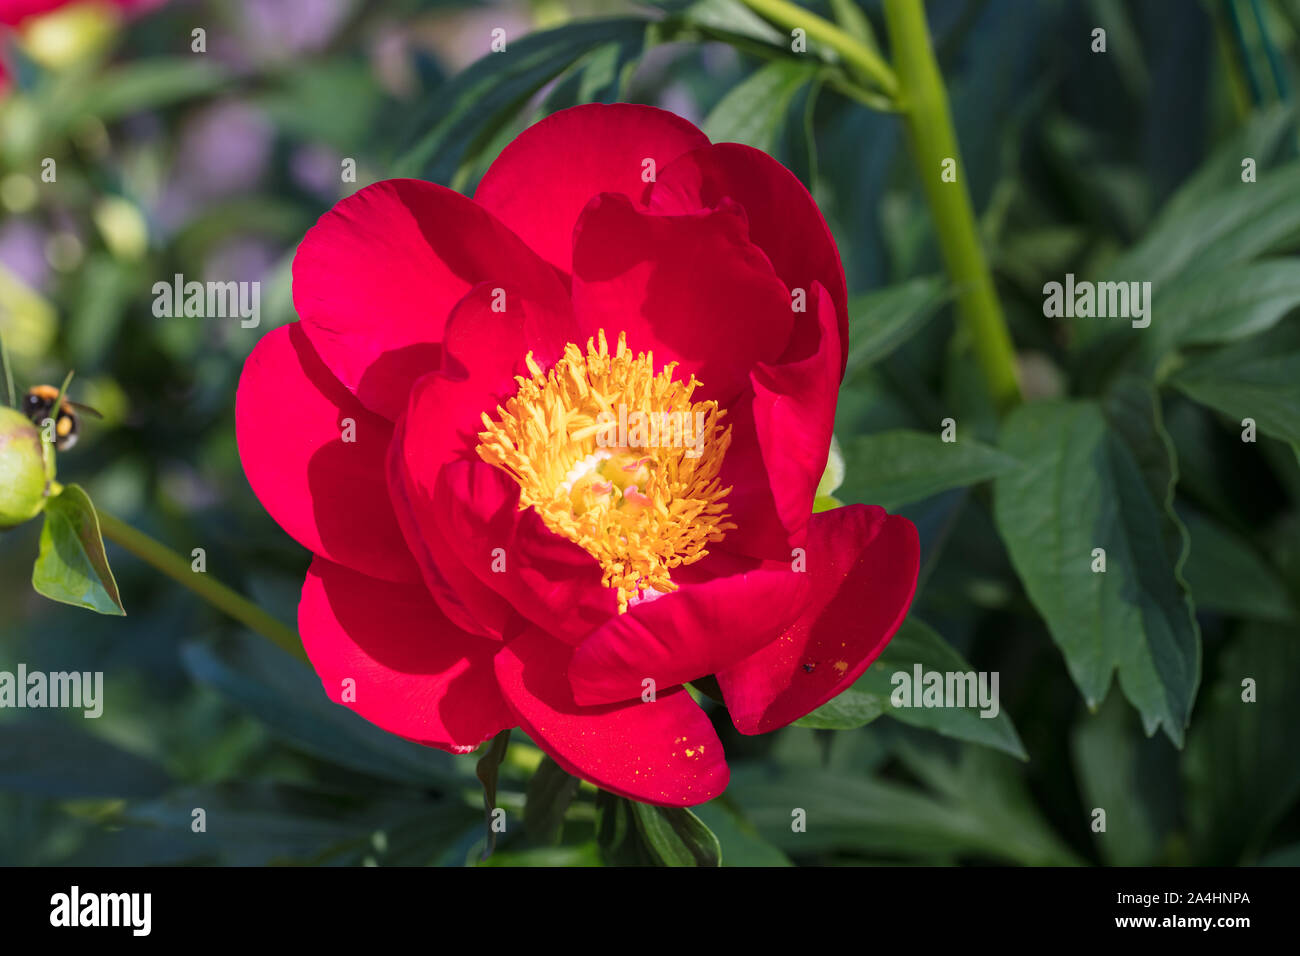 'Scarlett O'Hara' Common garden peony, Luktpion (Paeonia officinalis x Paeonia lactiflora) Stock Photo